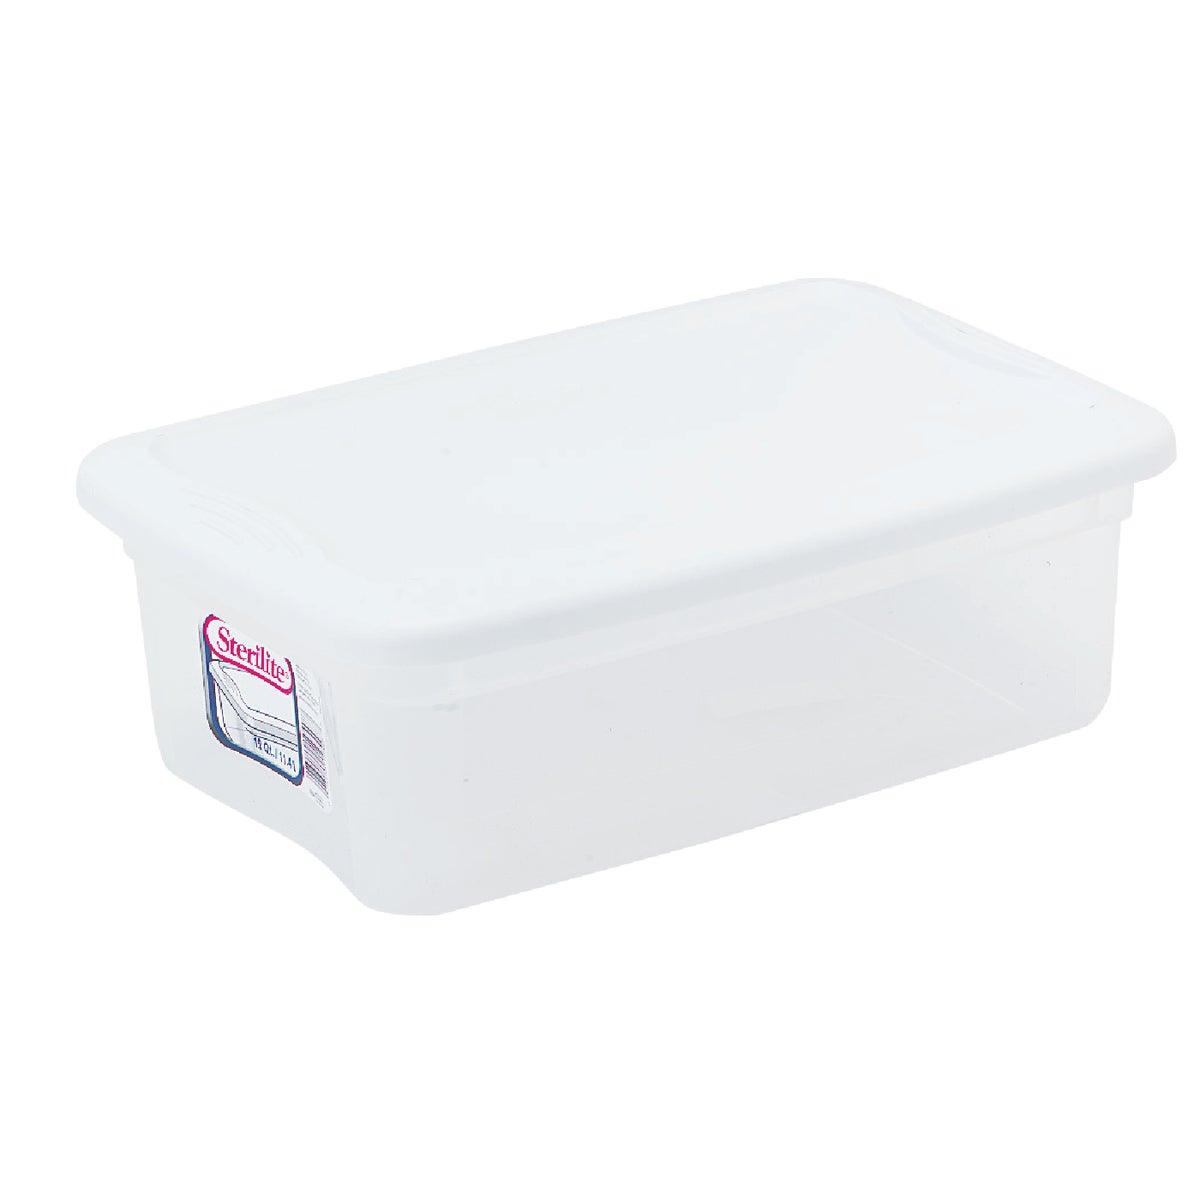 Sterilite? 16 Quart Basic Clear Storage Box with White Lid